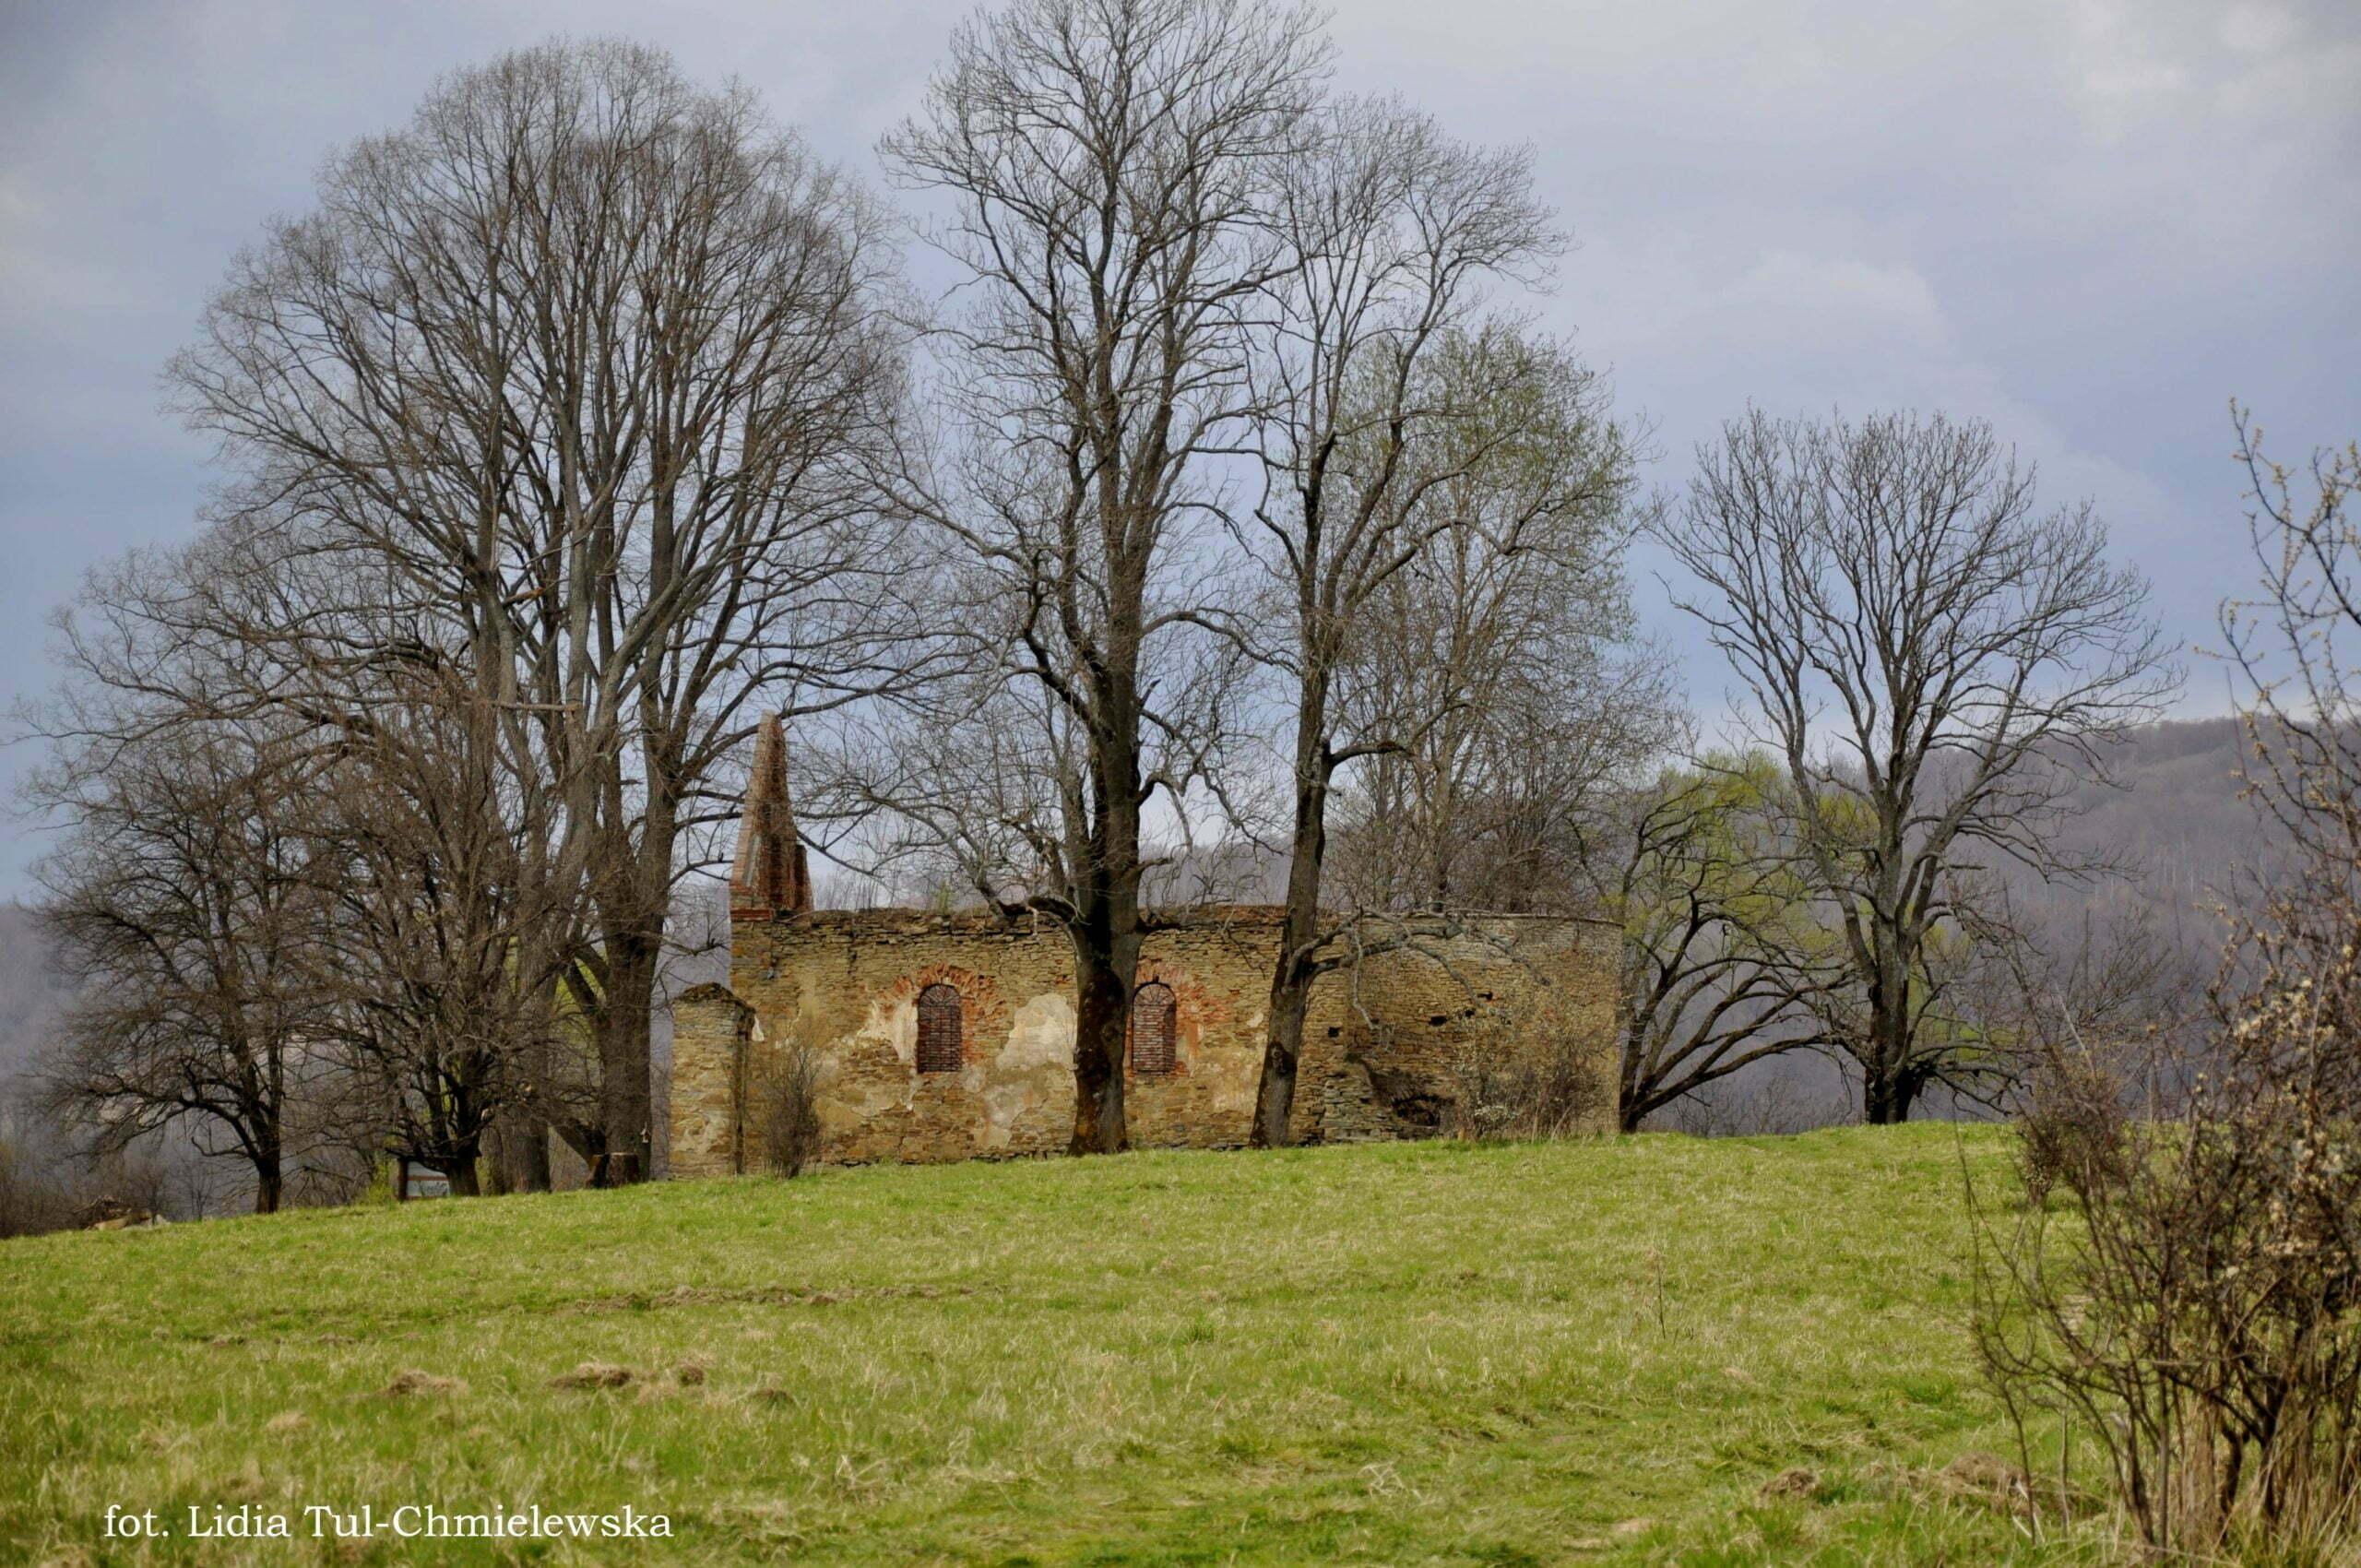 Ruiny cerkwi w Krywe fot. Lidia Tul-Chmielewska